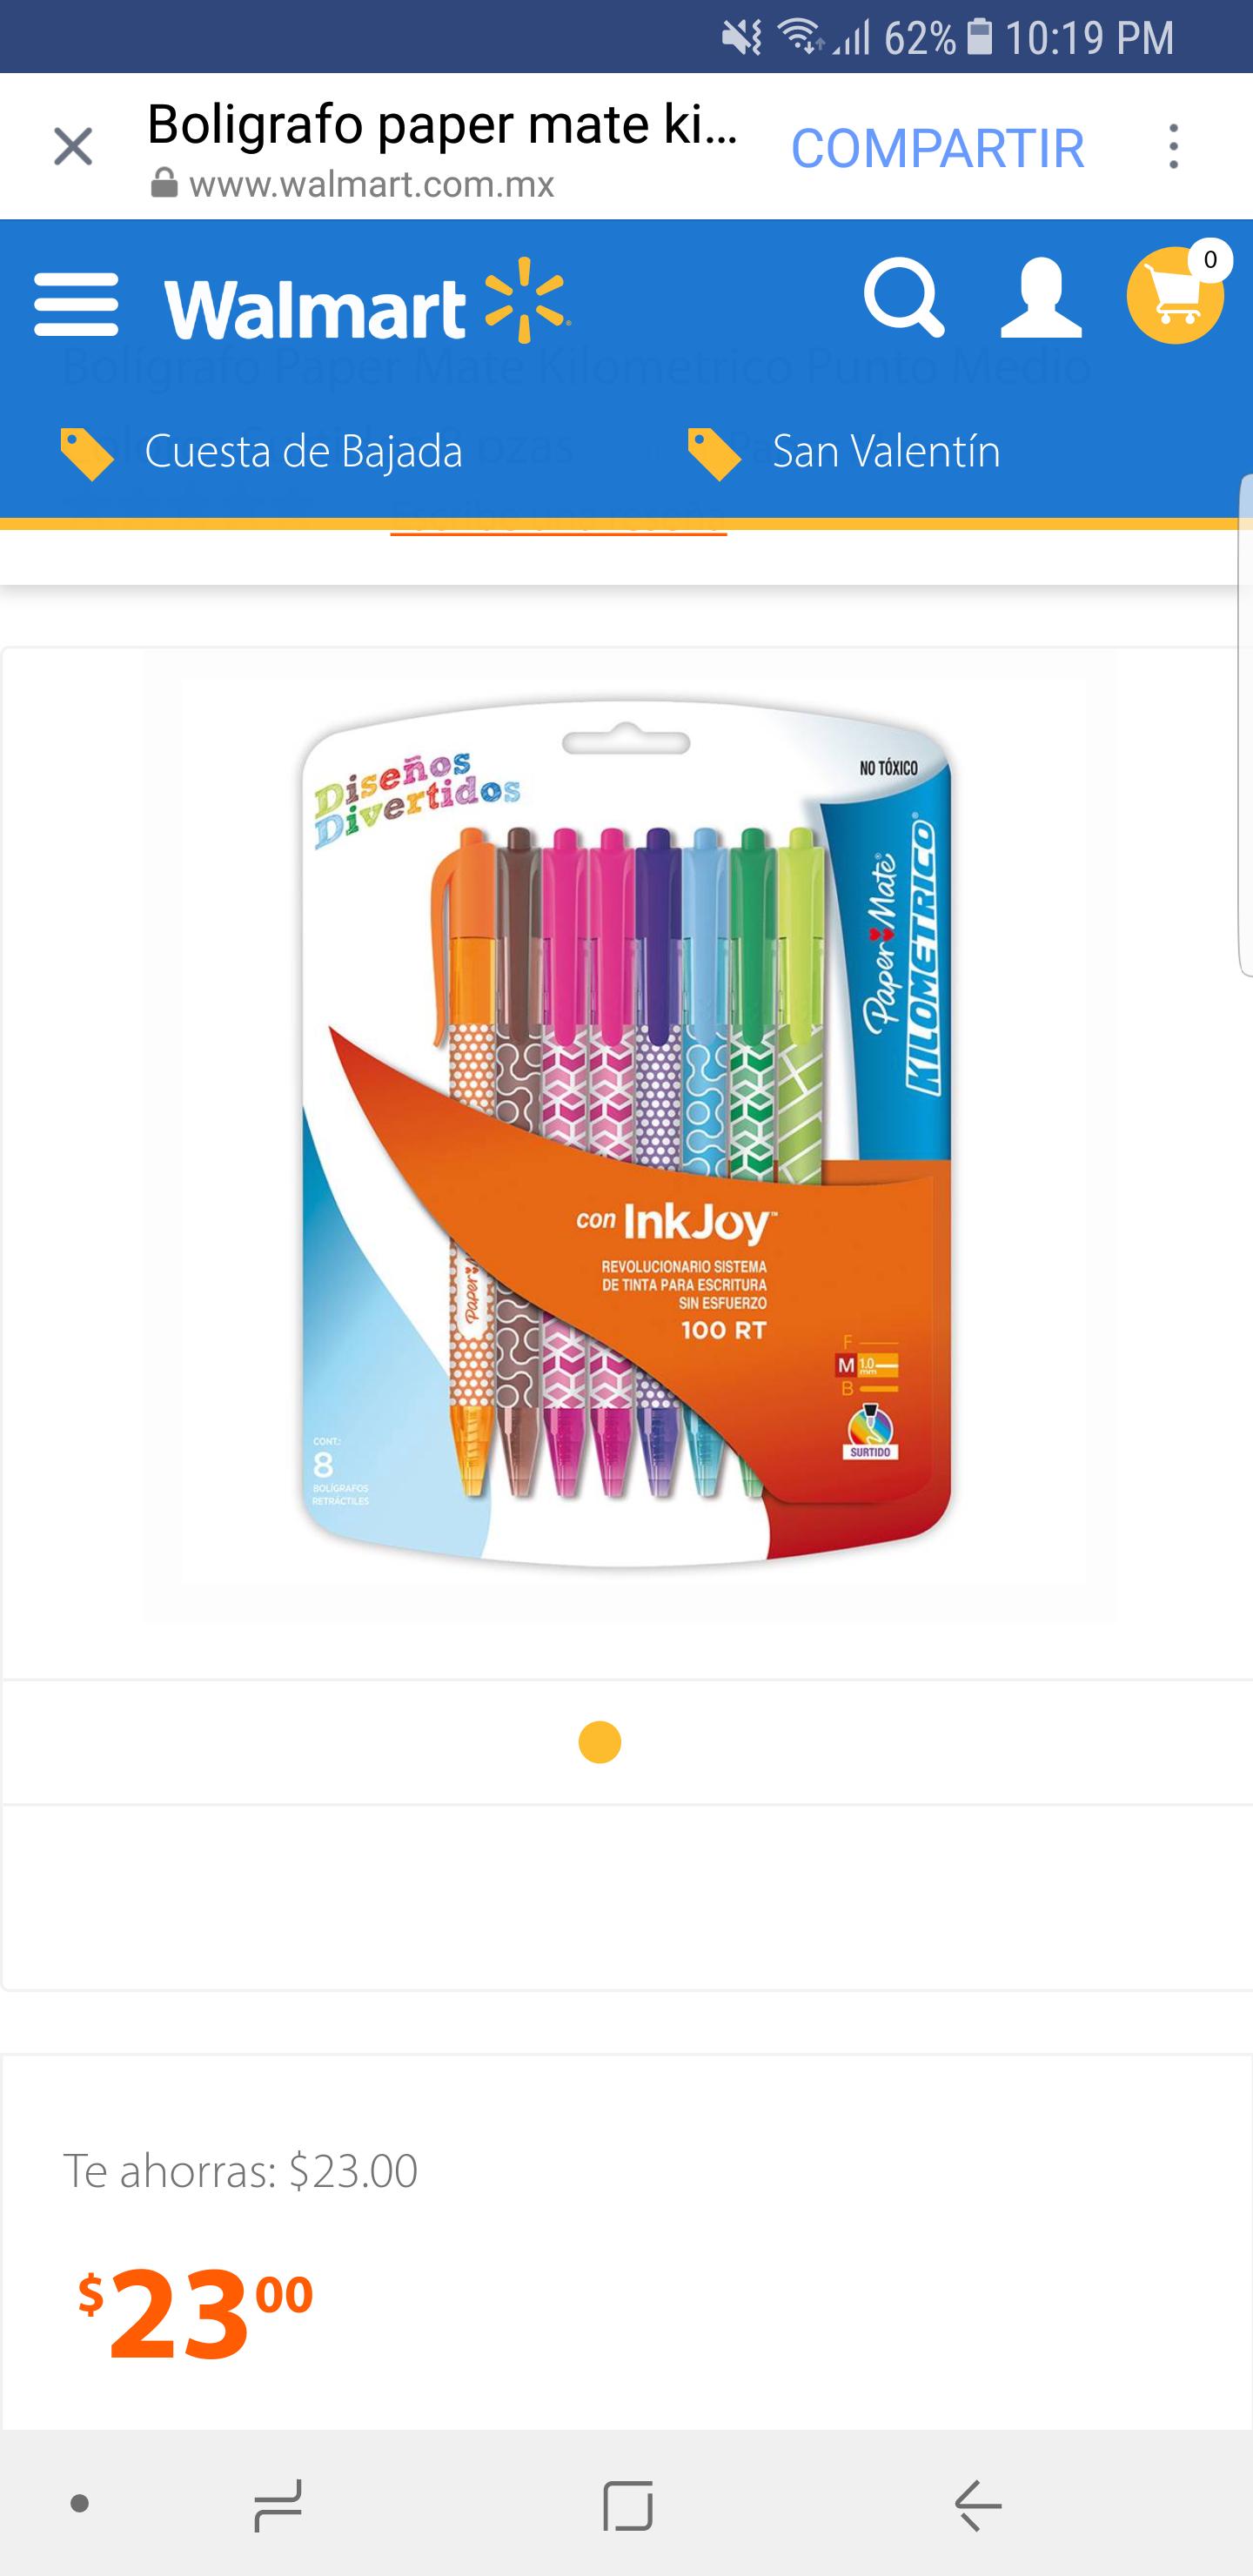 Walmart online: 8 plumas paper mate kilometrico de colores